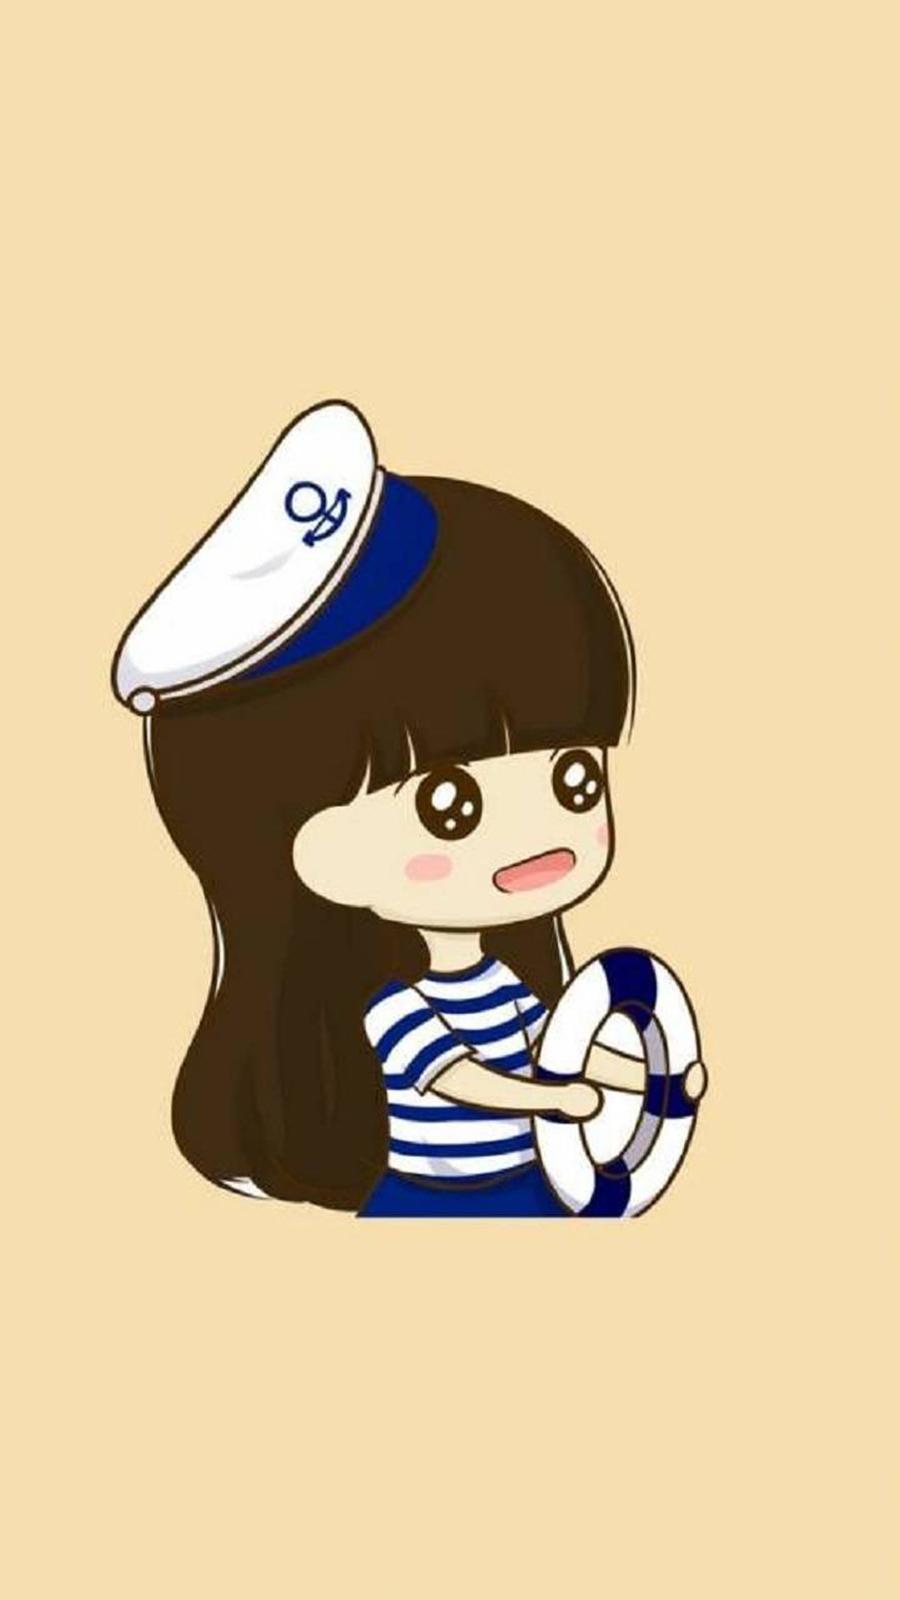 Sailor Girl Wallpapers Now Download